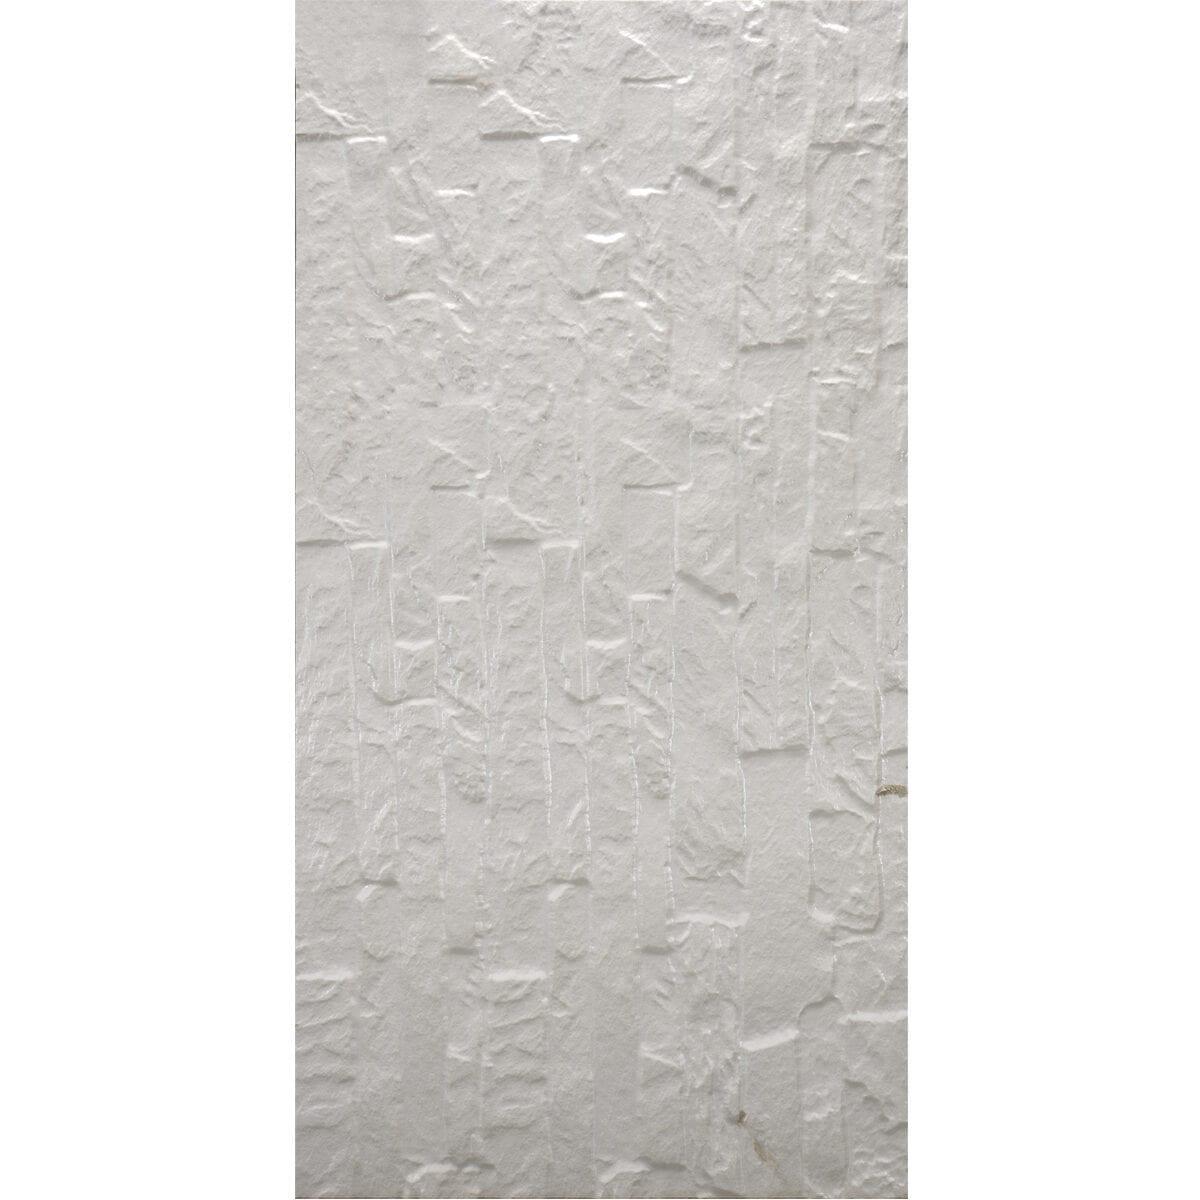 Brackley white brick 12x24 d00045 1